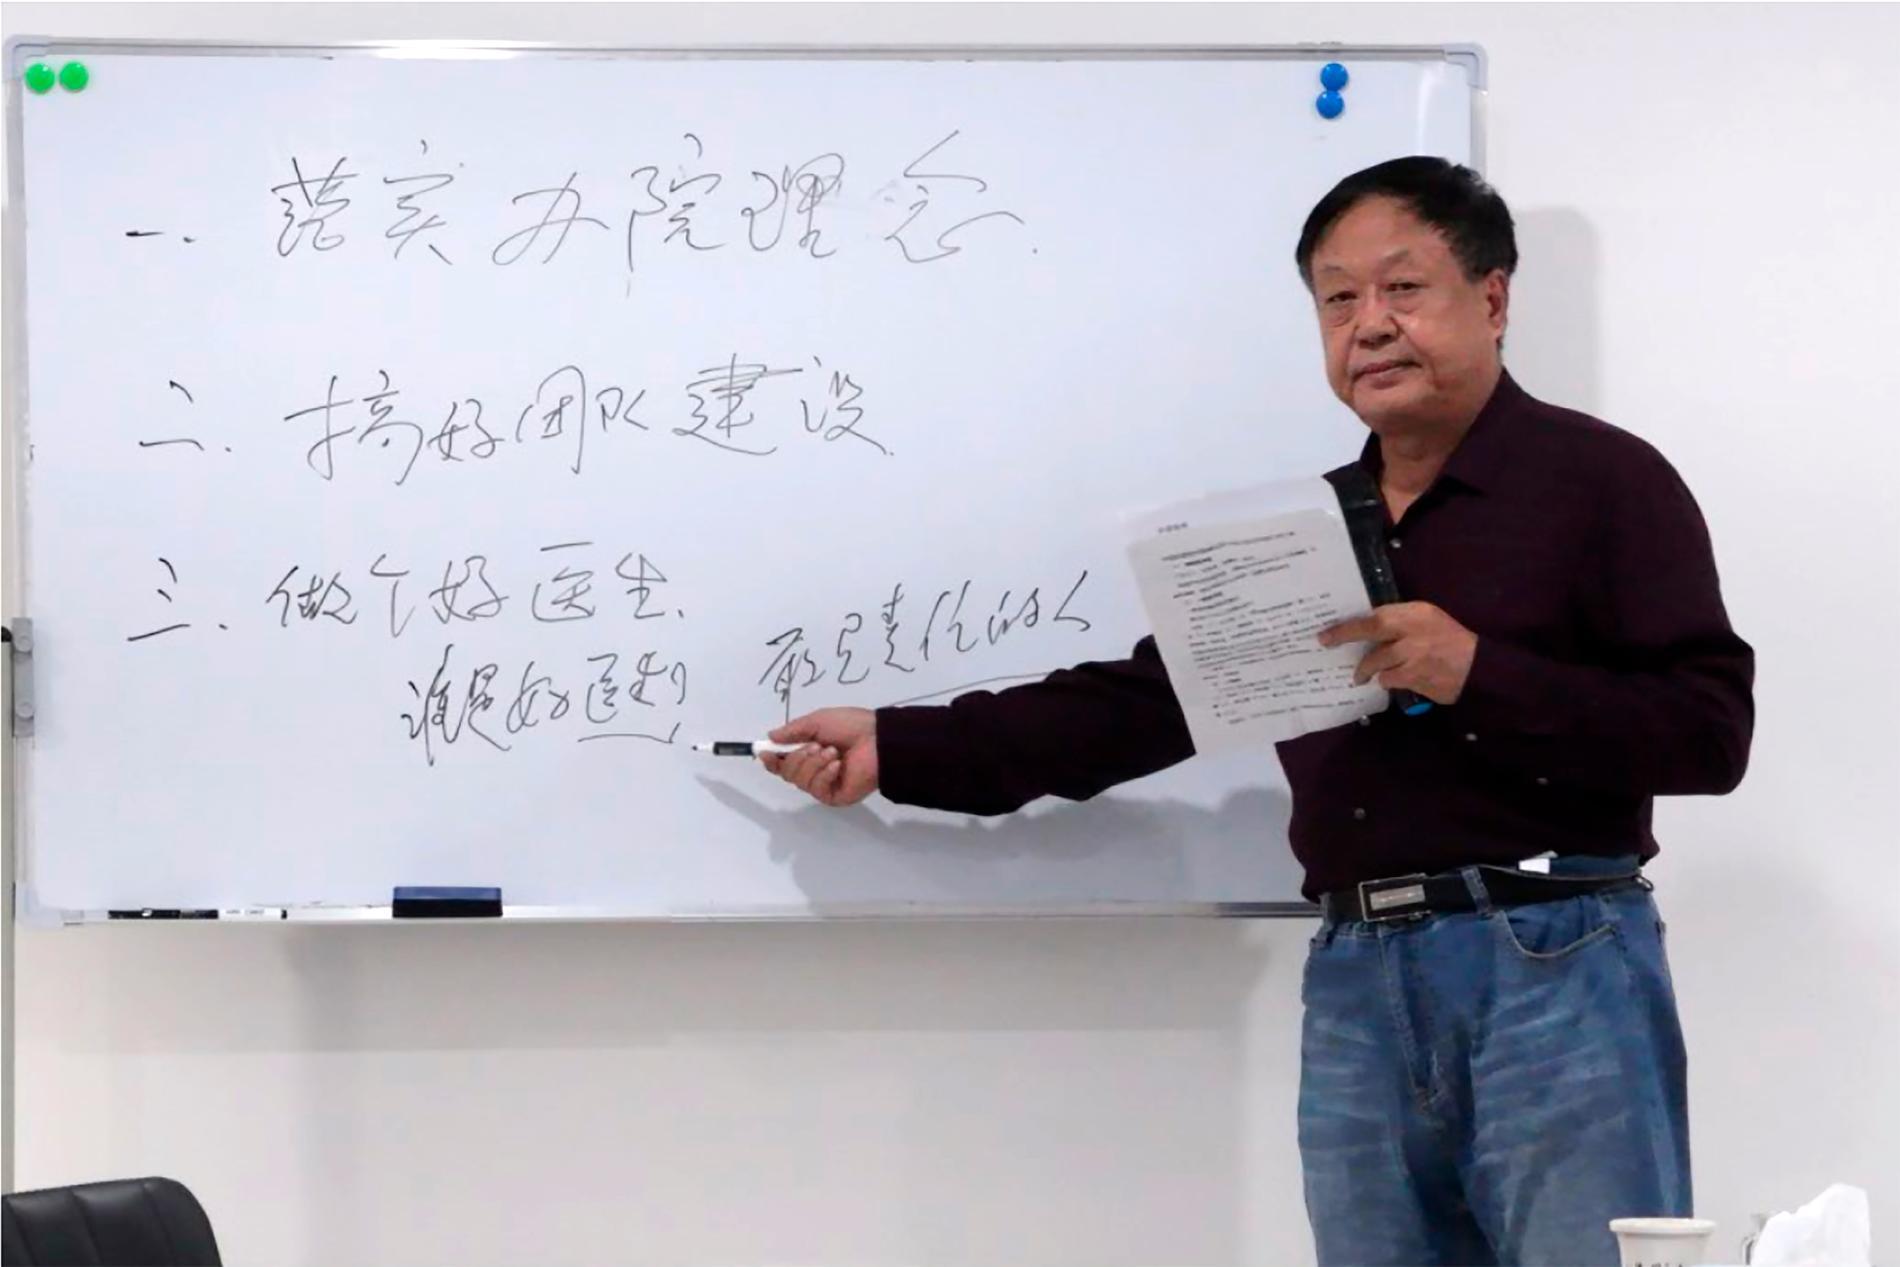 Den kinesiske lantbruksmogulen Sun Dawu har dömts till 18 års fängelse.